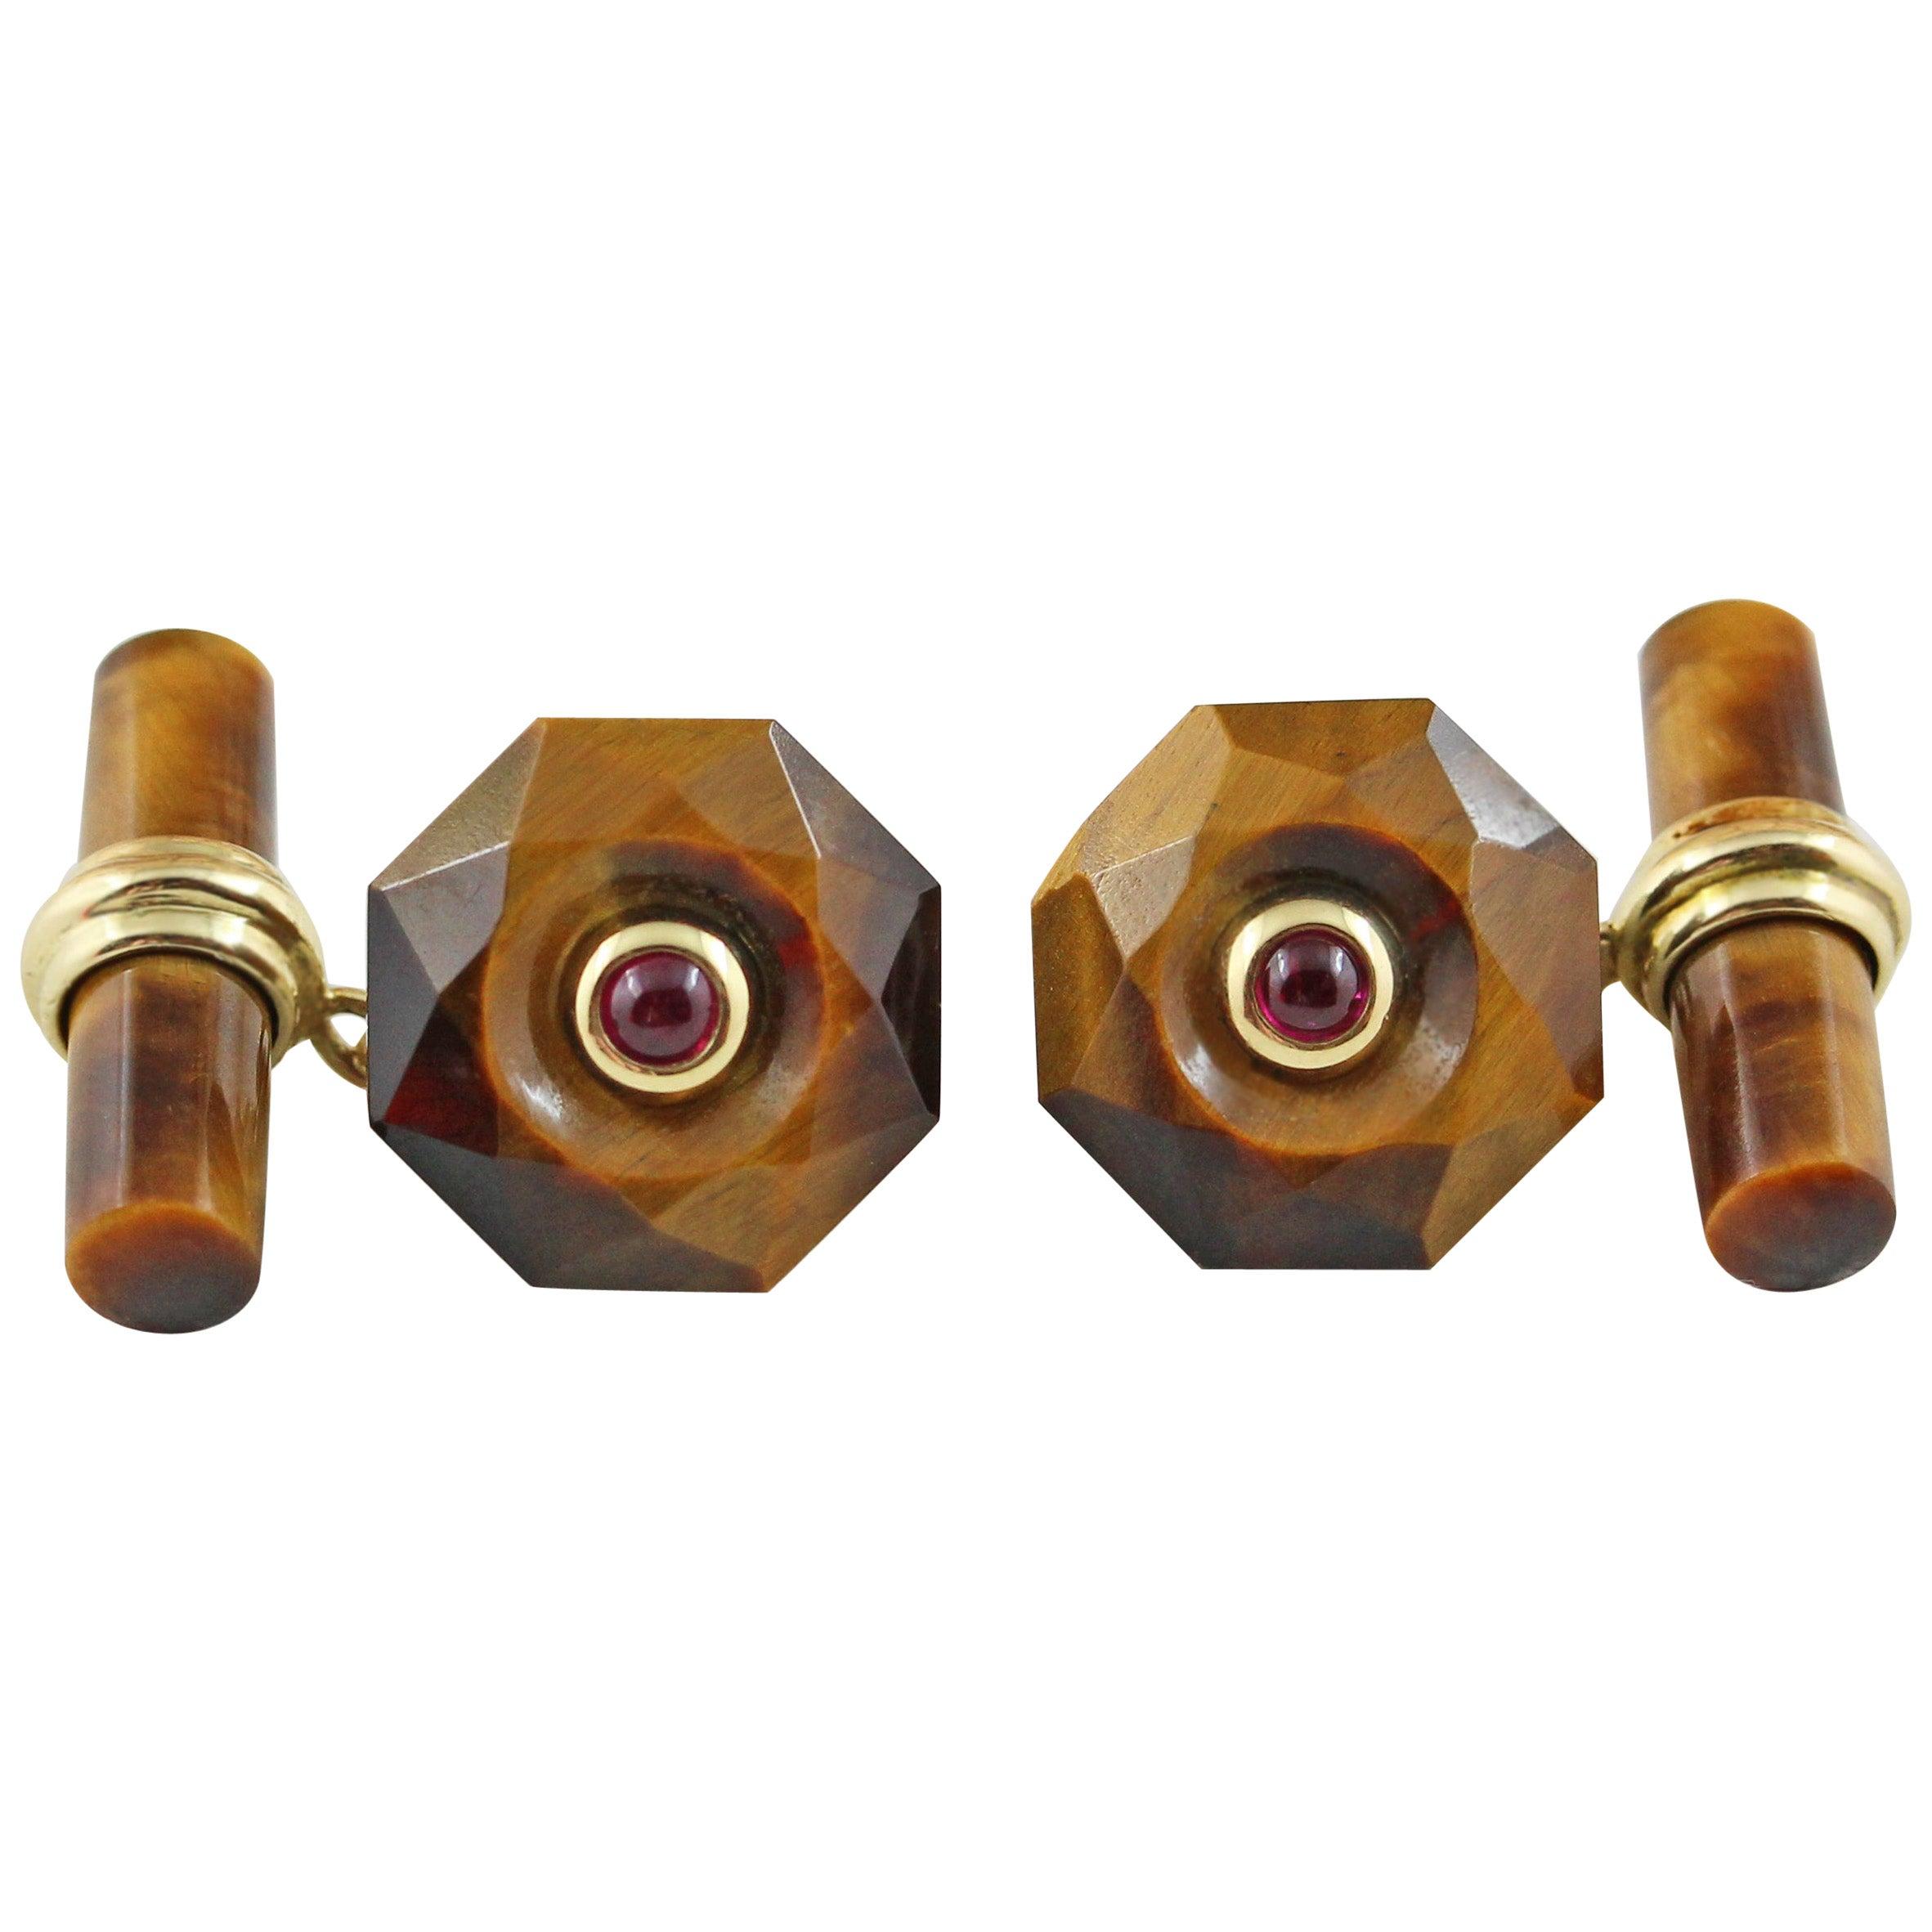 18 Karat Yellow Gold Tiger's Eye Cabochon Rubies Cufflinks Convex Multifaceted